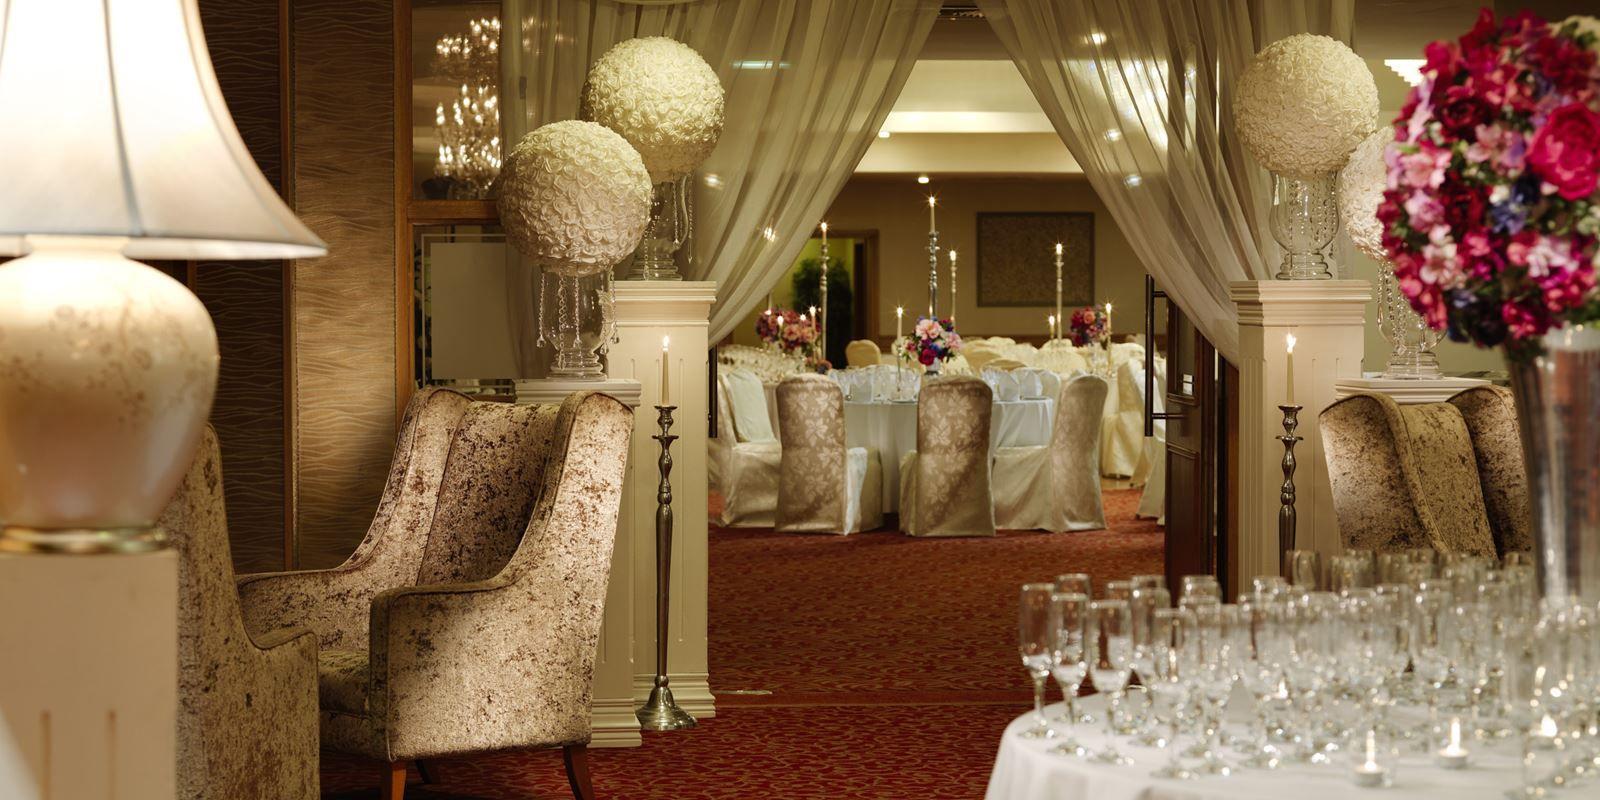 Gorgeous weddingdecor at killyhevlin lakeside hotel in enniskillen gorgeous weddingdecor at killyhevlin lakeside hotel in enniskillen junglespirit Image collections